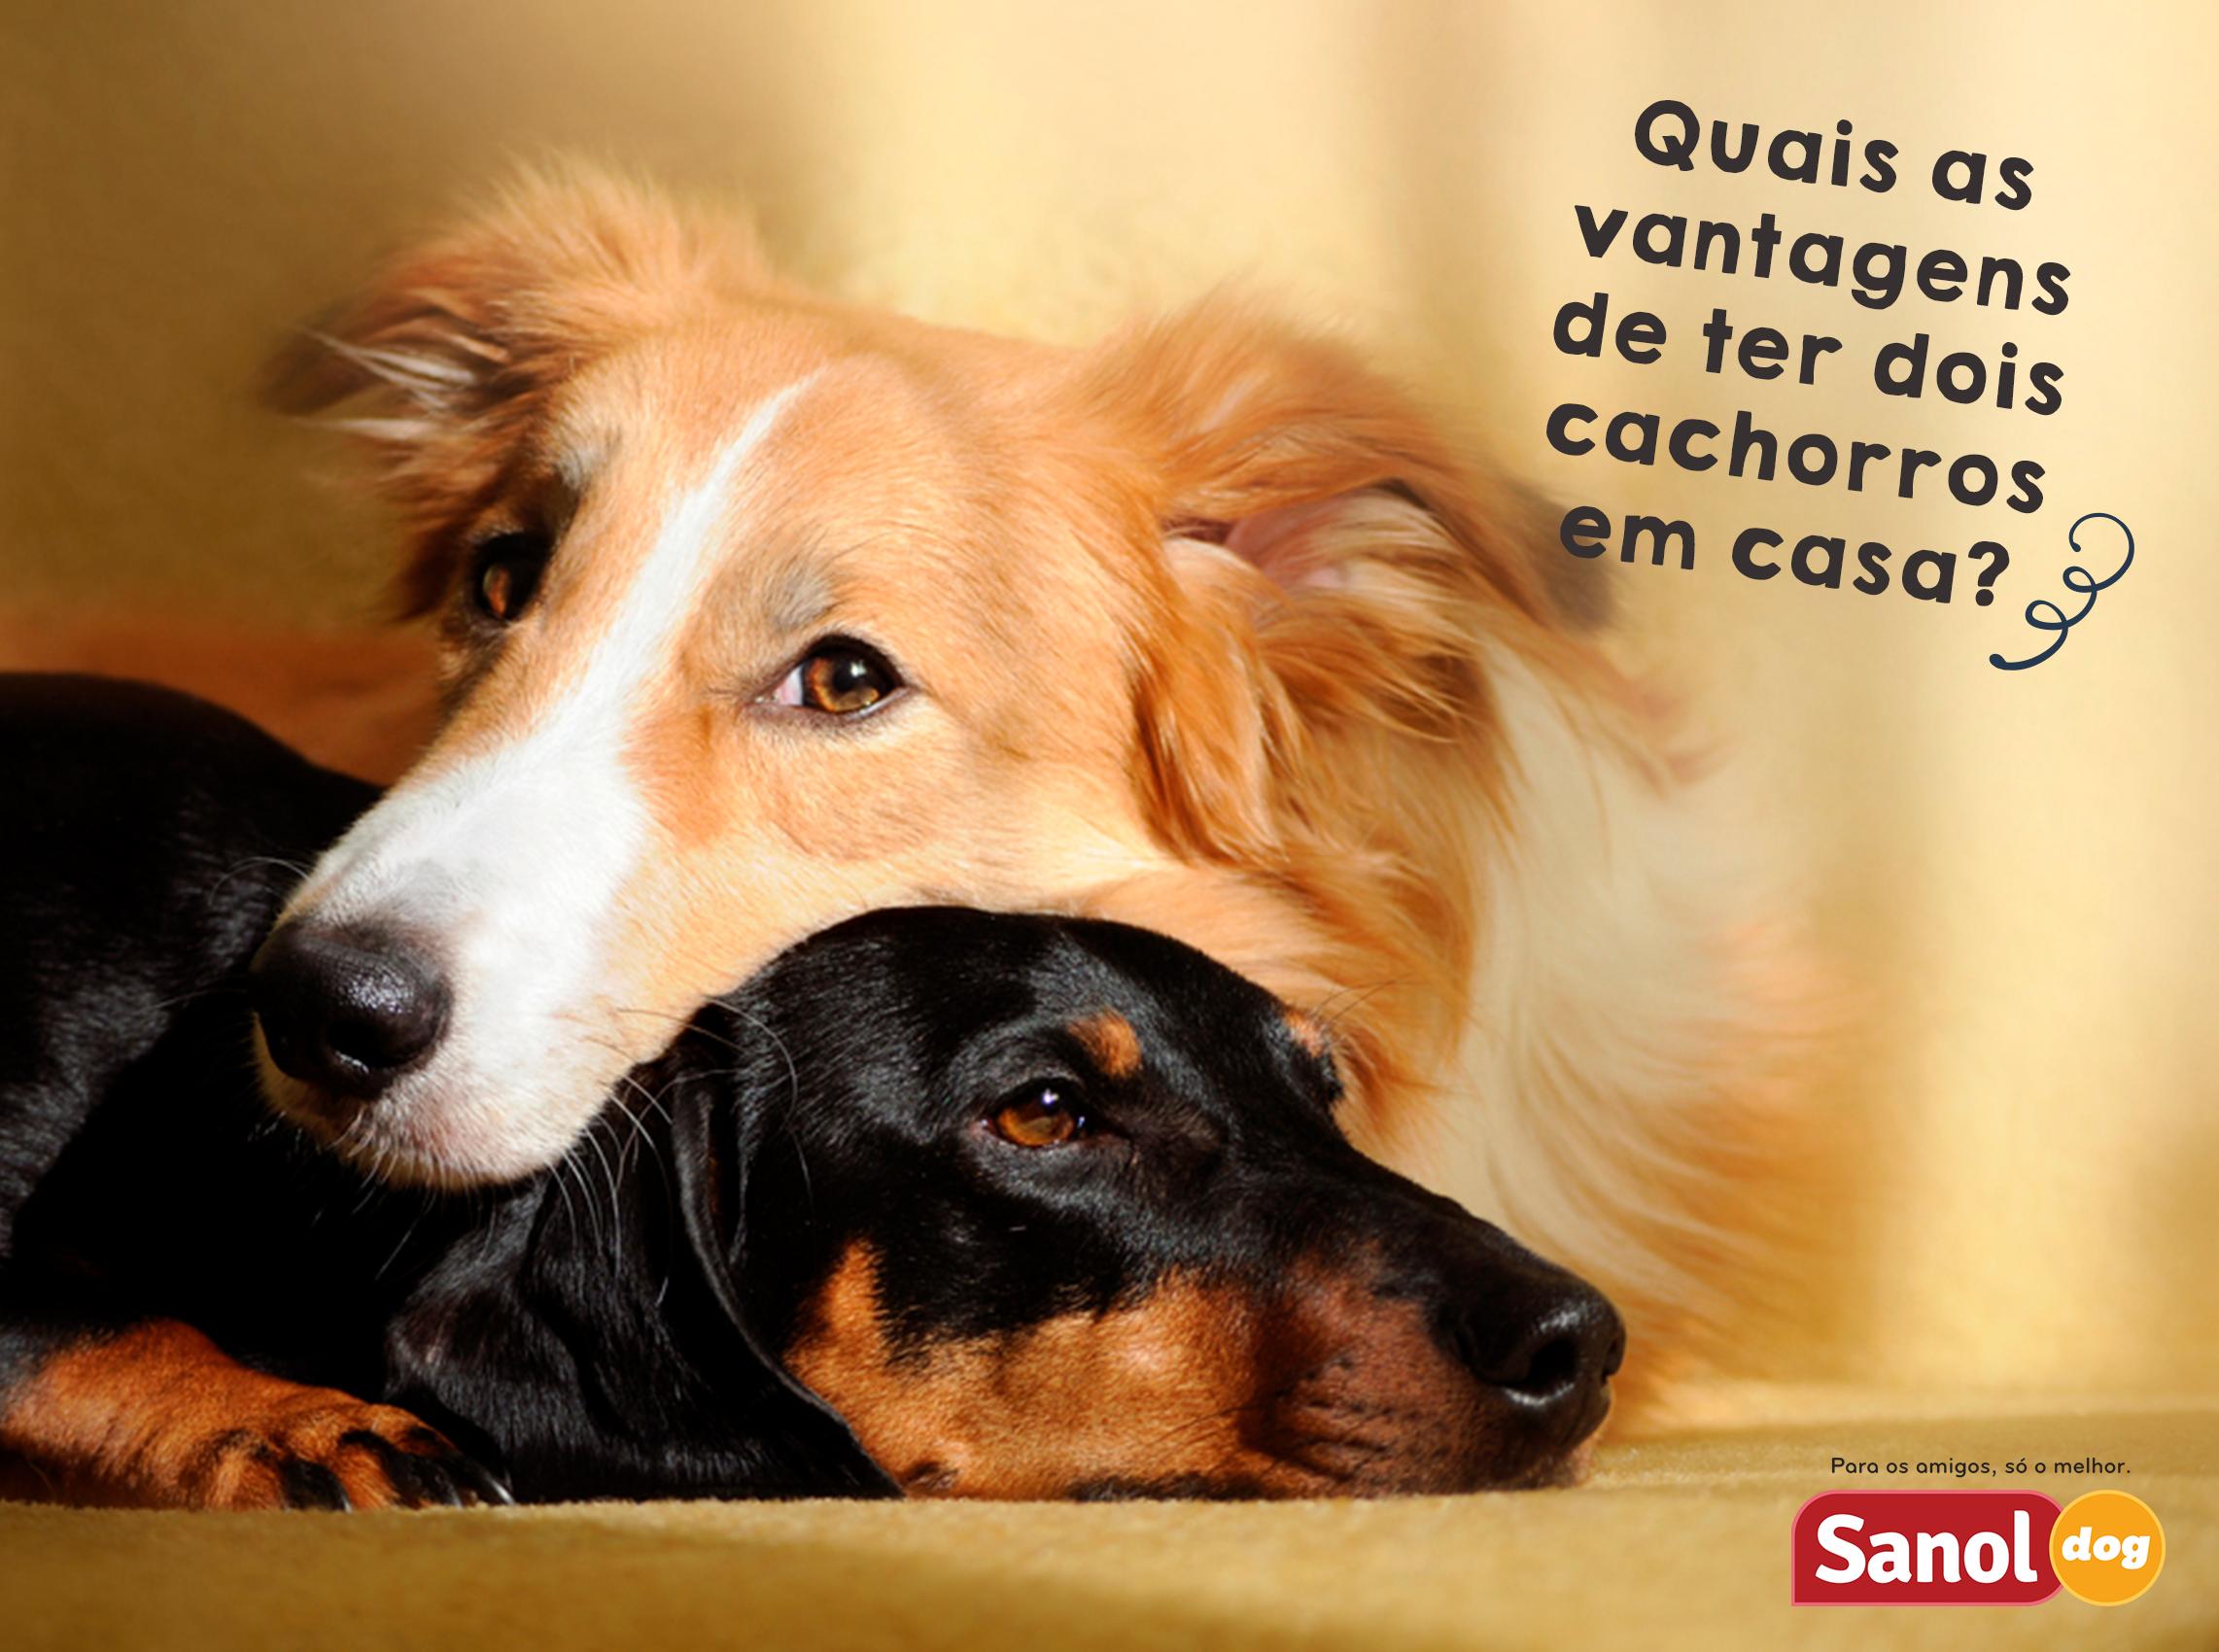 57e06d15cf Blog - Página 4 de 15 - Sanol Dog